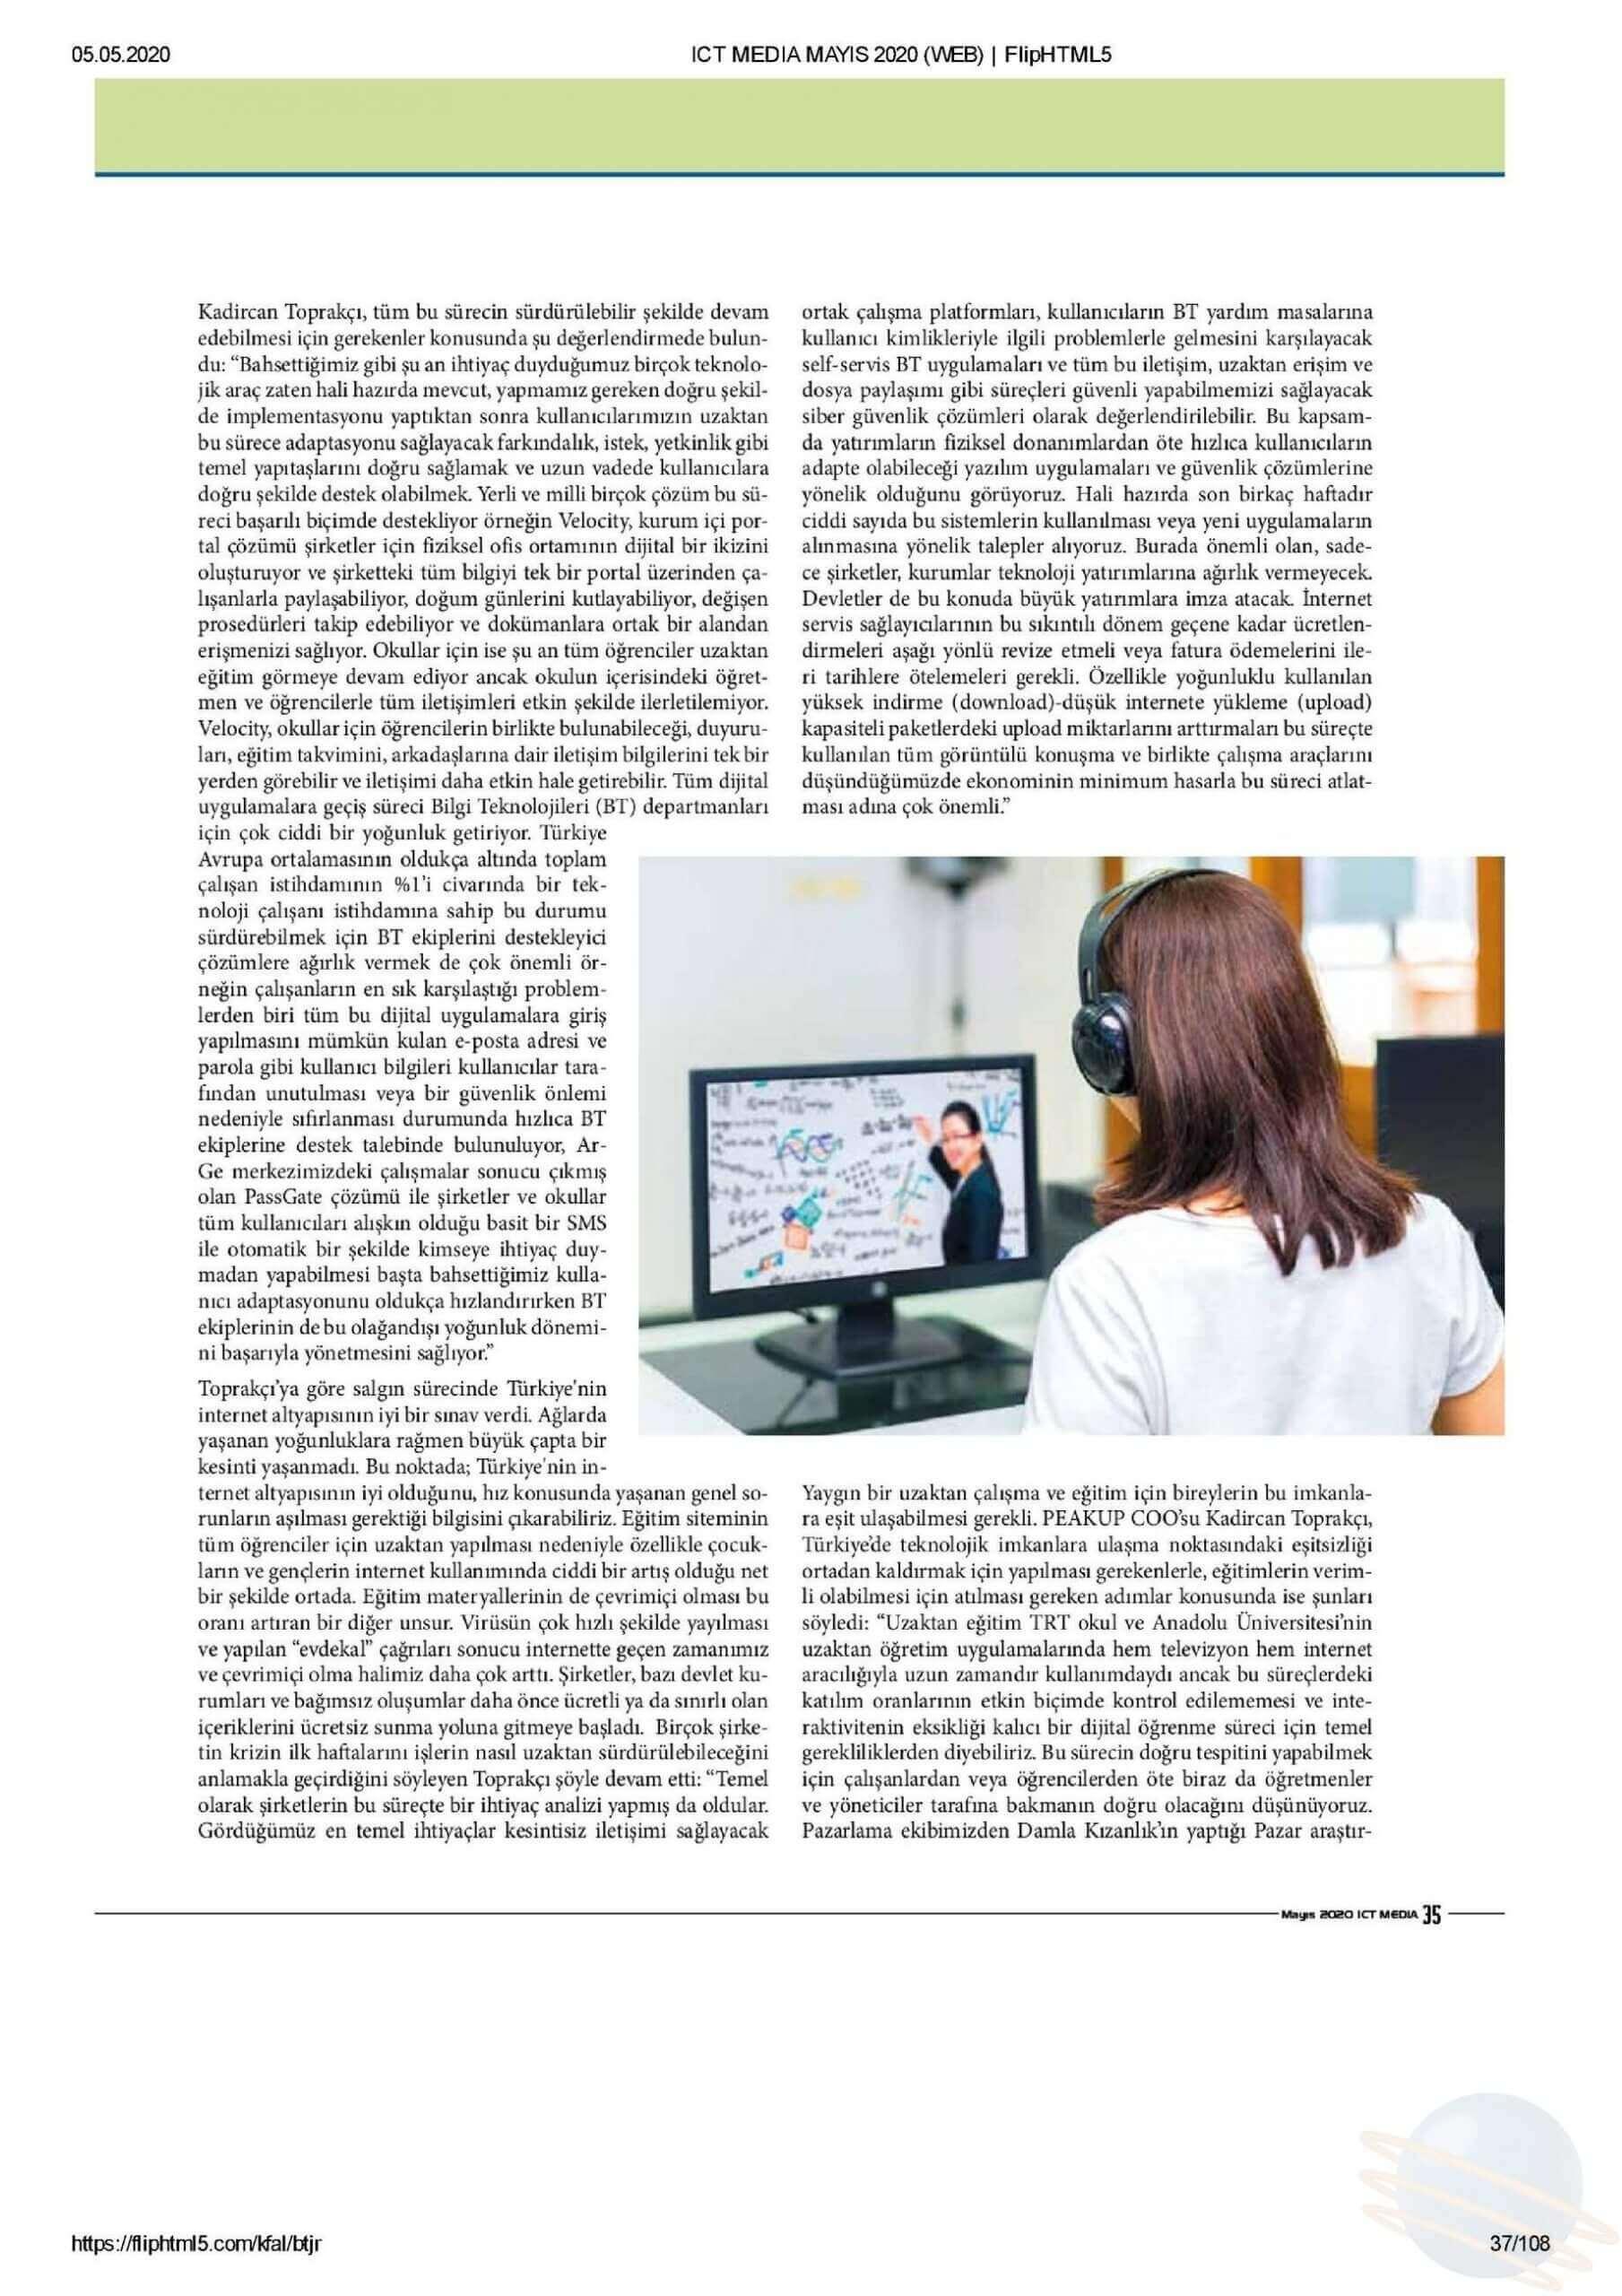 ict-media-2